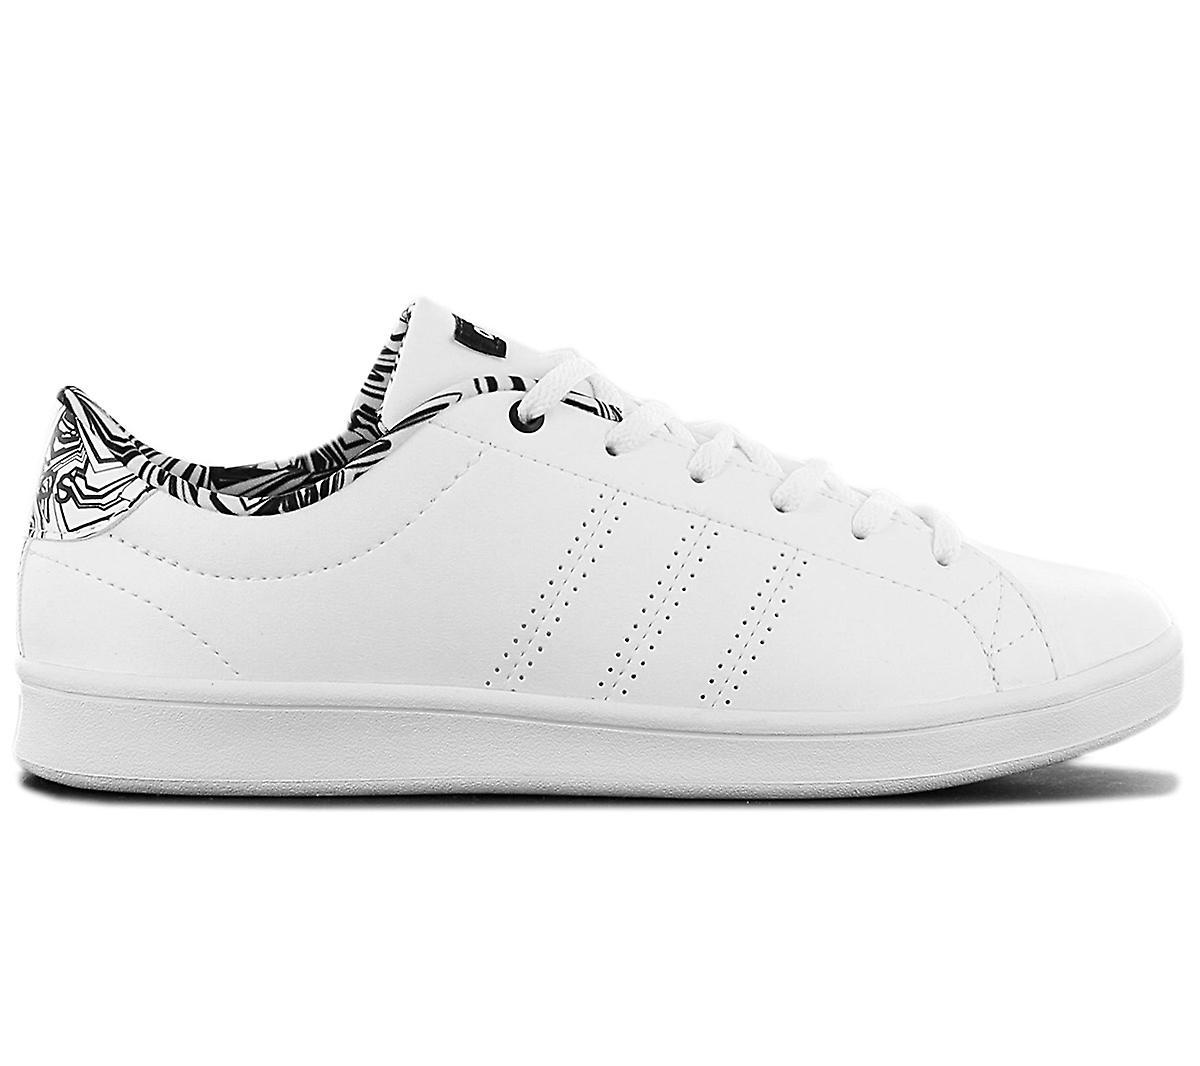 adidas Advantage CL QT W - Damen Schuhe Weiß DB1858 Sneakers Sportschuhe IhmRS